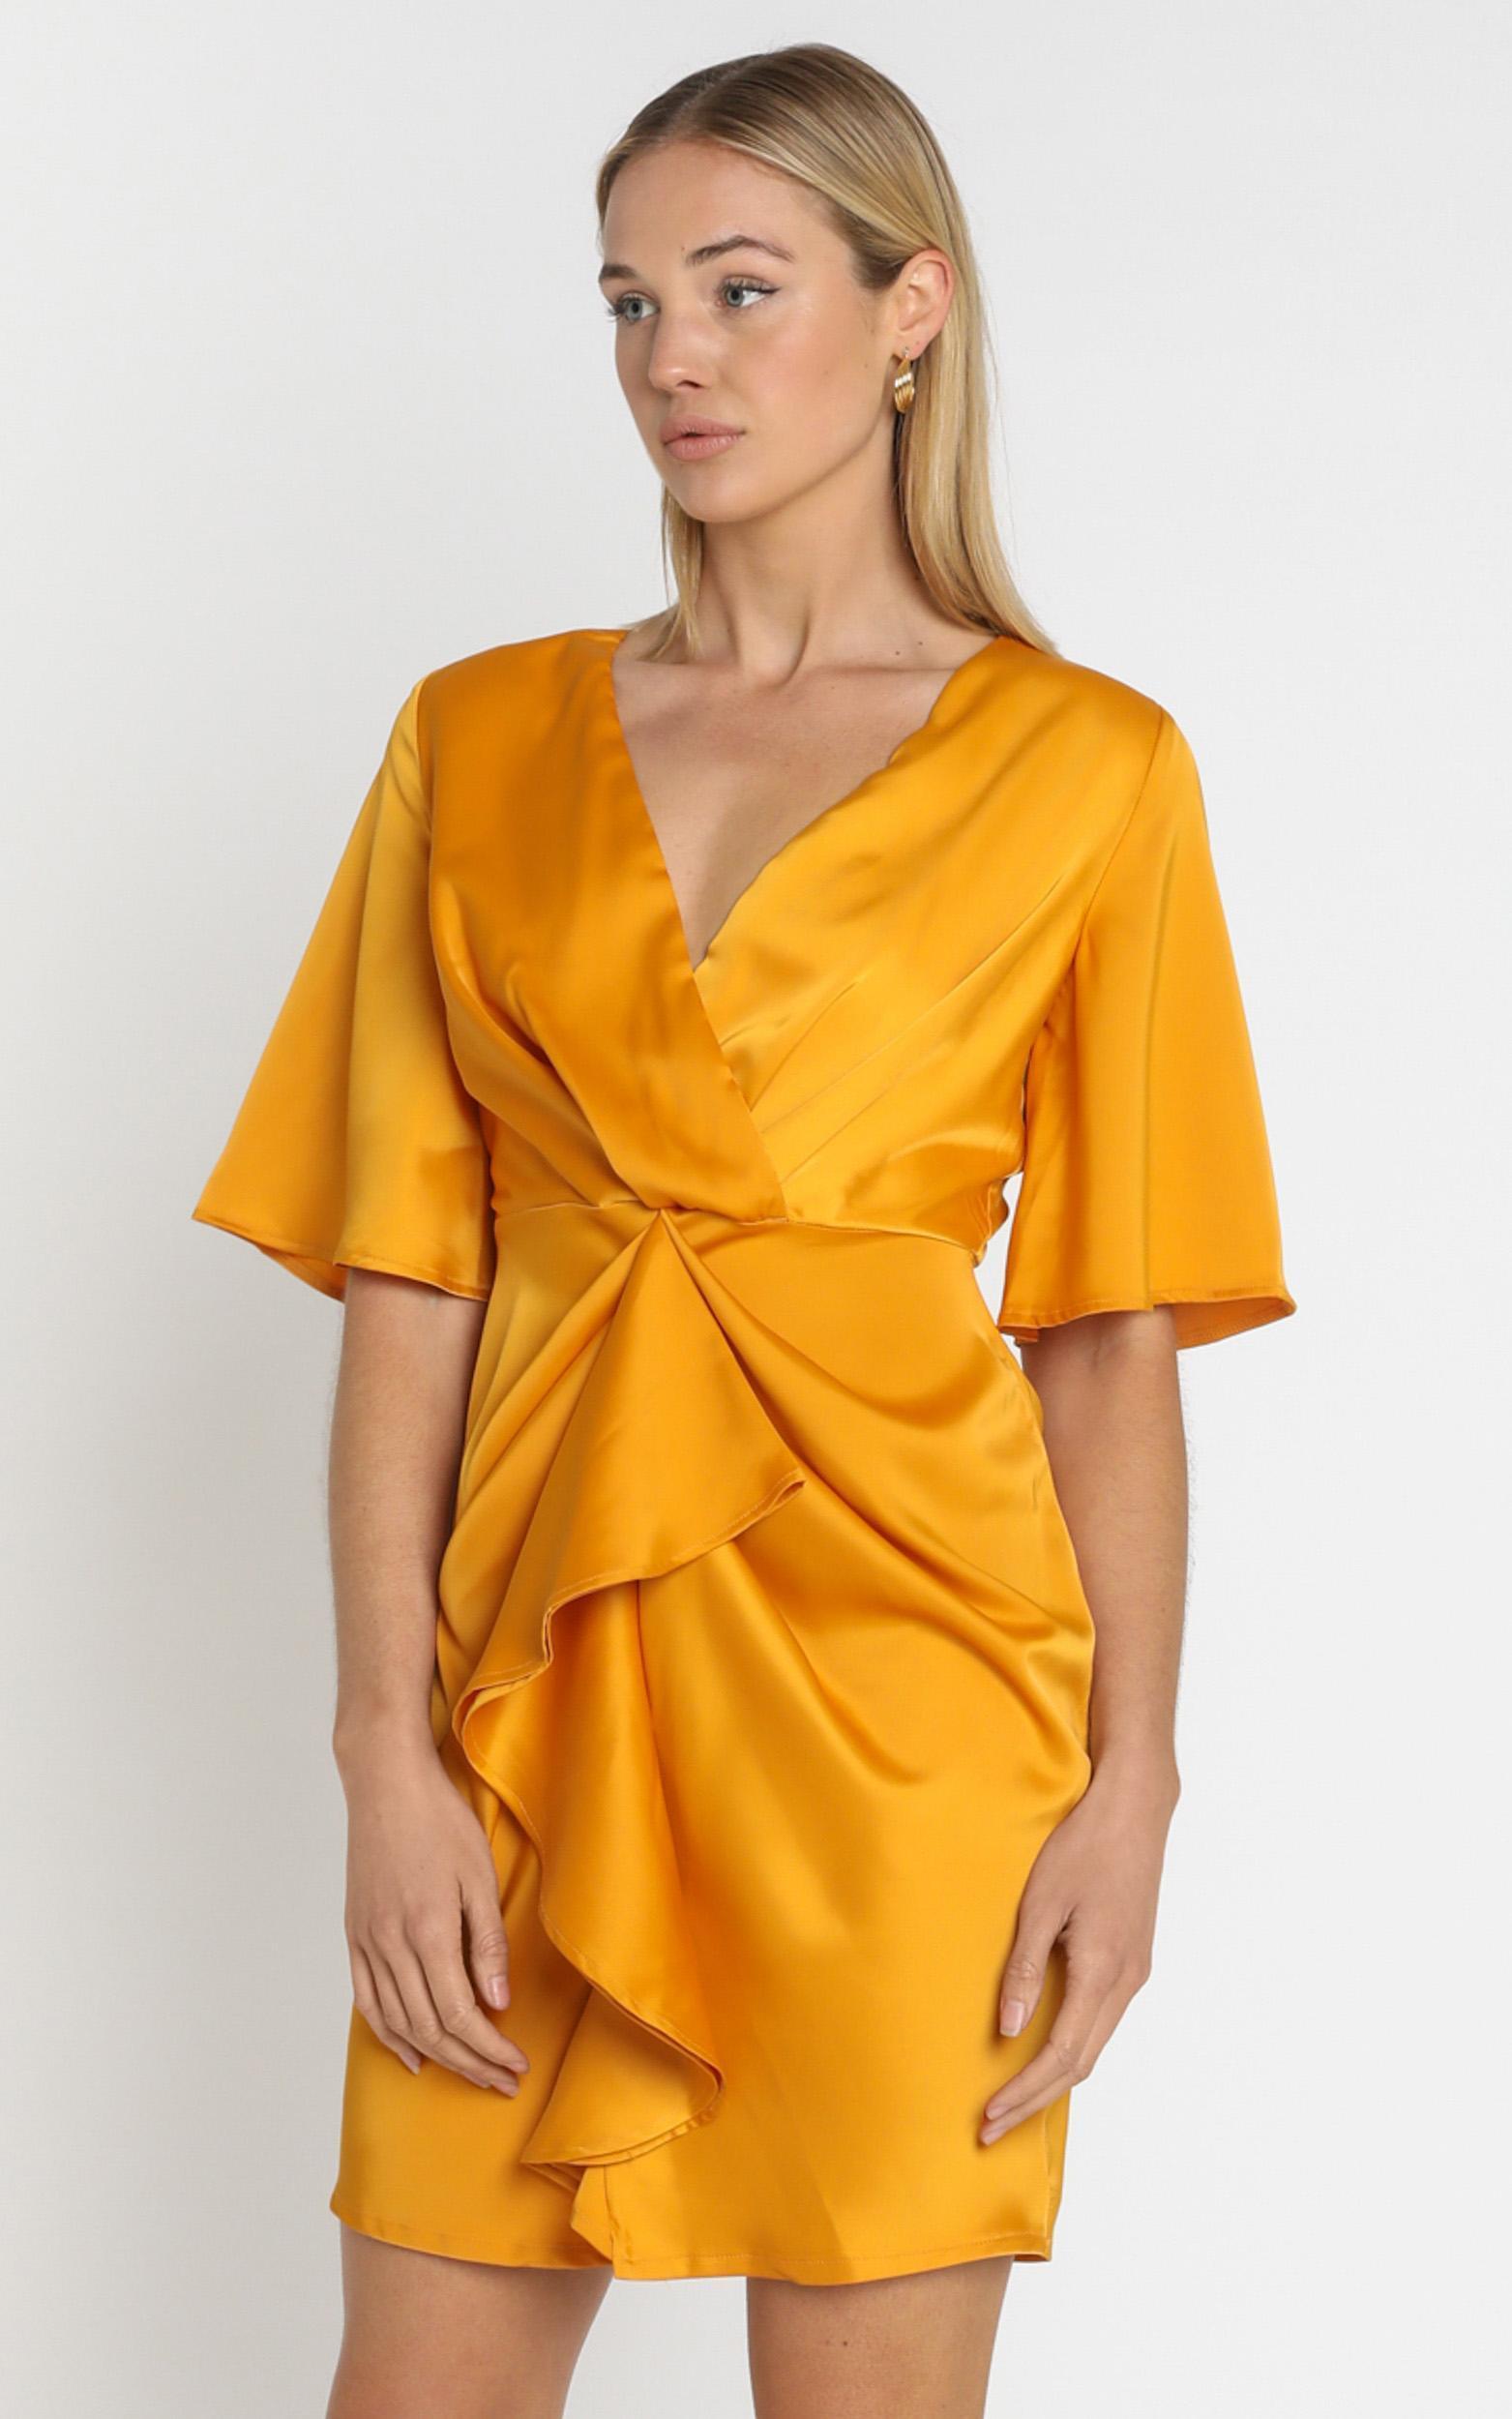 Spread Your Love dress in tangerine satin - 16 (XXL), Orange, hi-res image number null